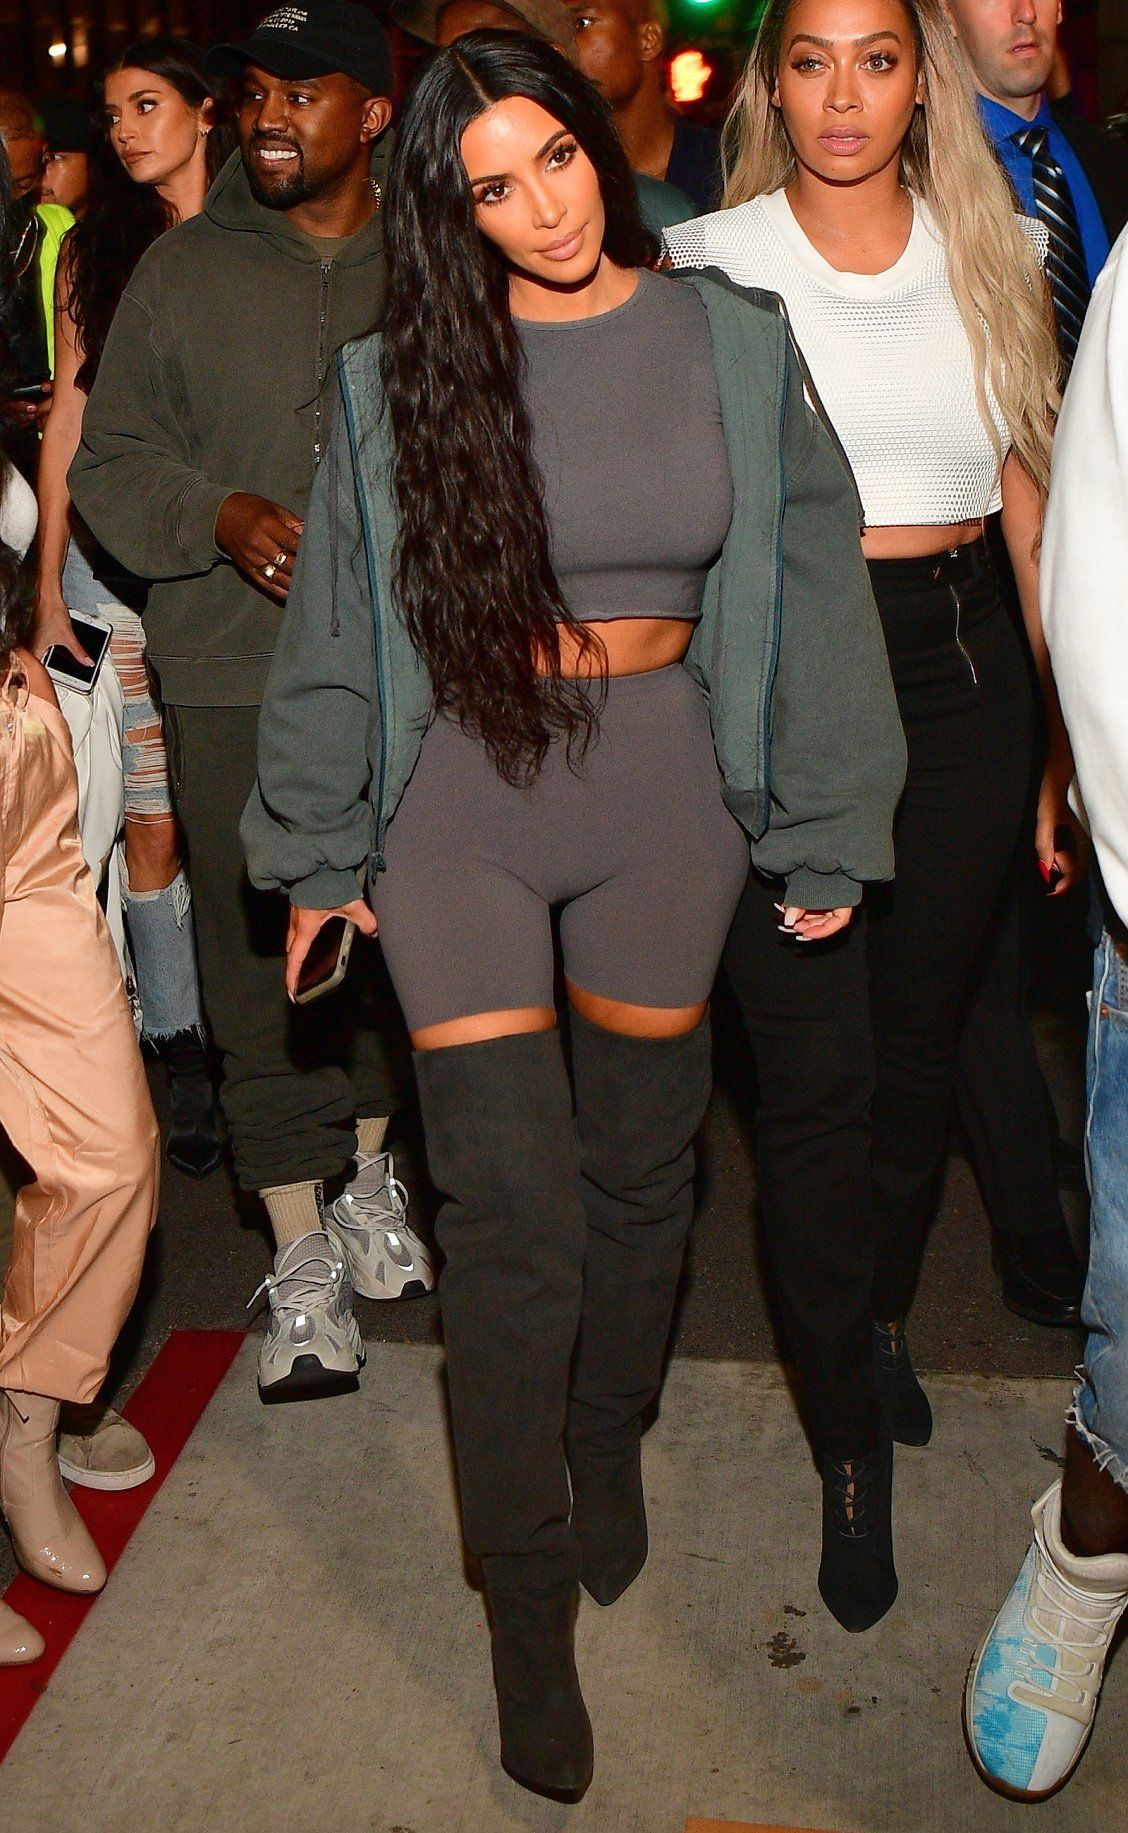 a1d31855115ce Kim Kardashian in a sweatshirt crop top with biker shorts and a green jacket